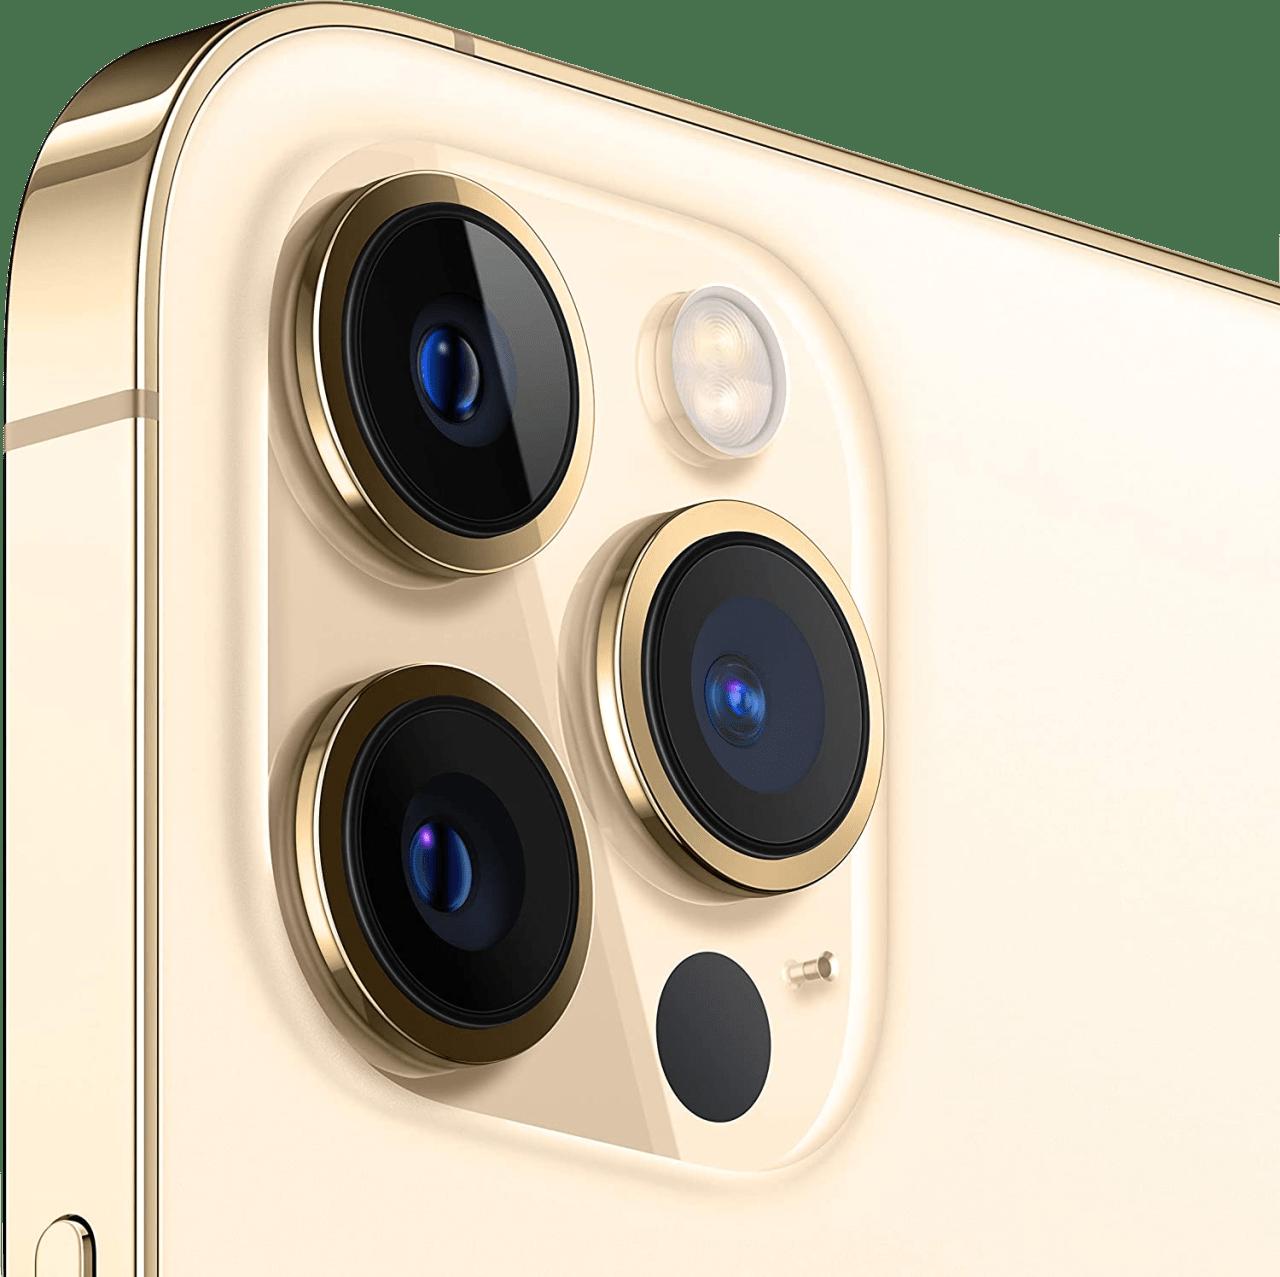 Gold Apple iPhone 12 Pro Max - 128GB - Dual Sim.2